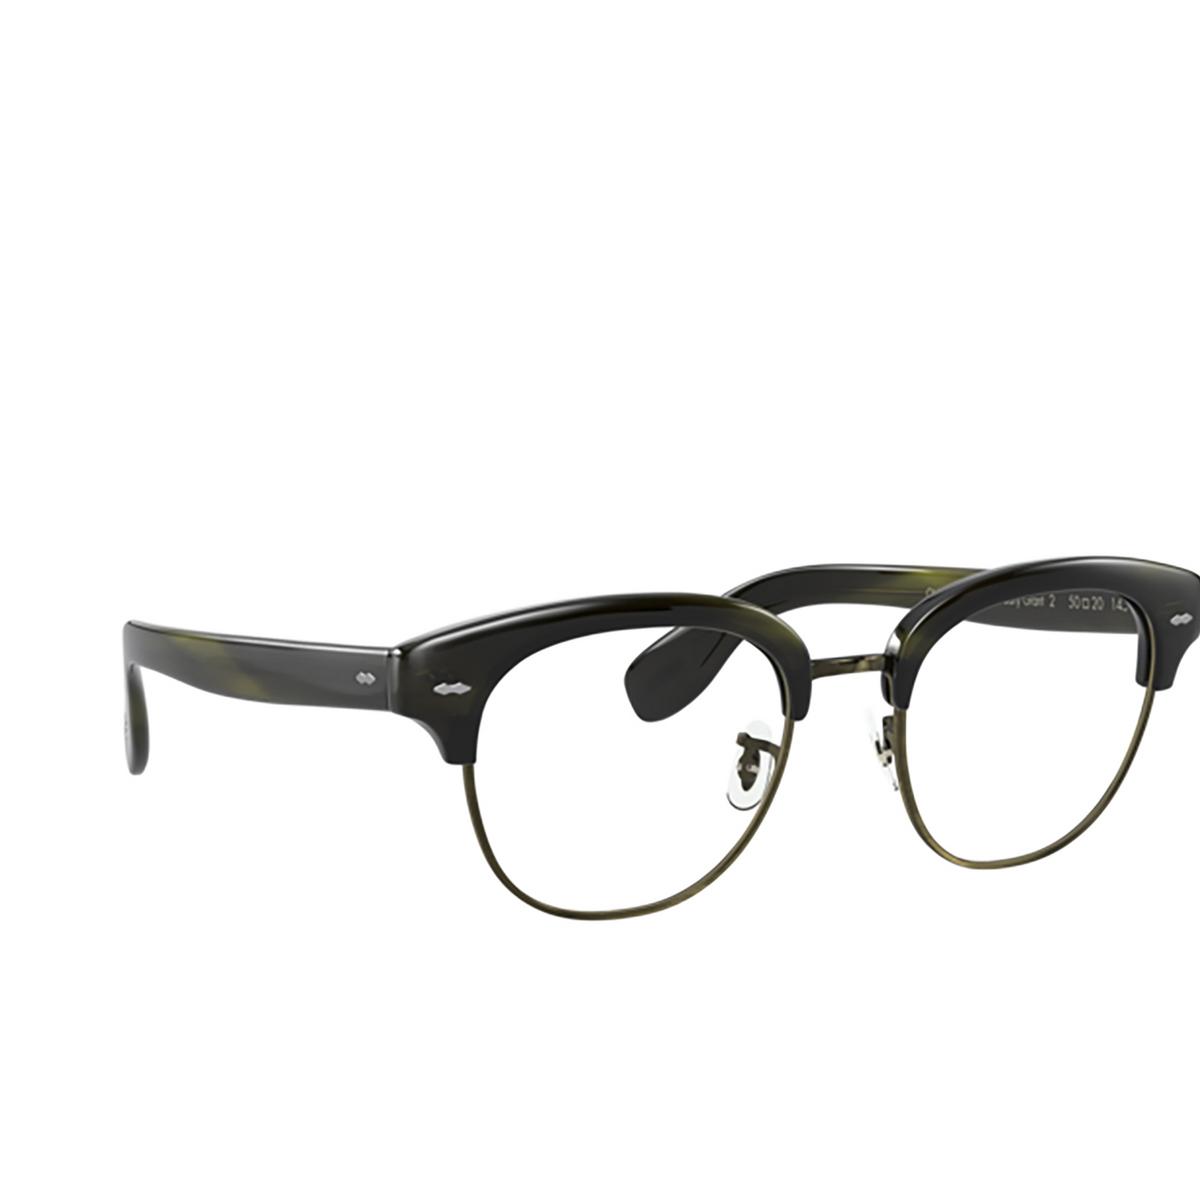 Oliver Peoples® Square Eyeglasses: Cary Grant 2 OV5436 color Emerald Bark 1680.